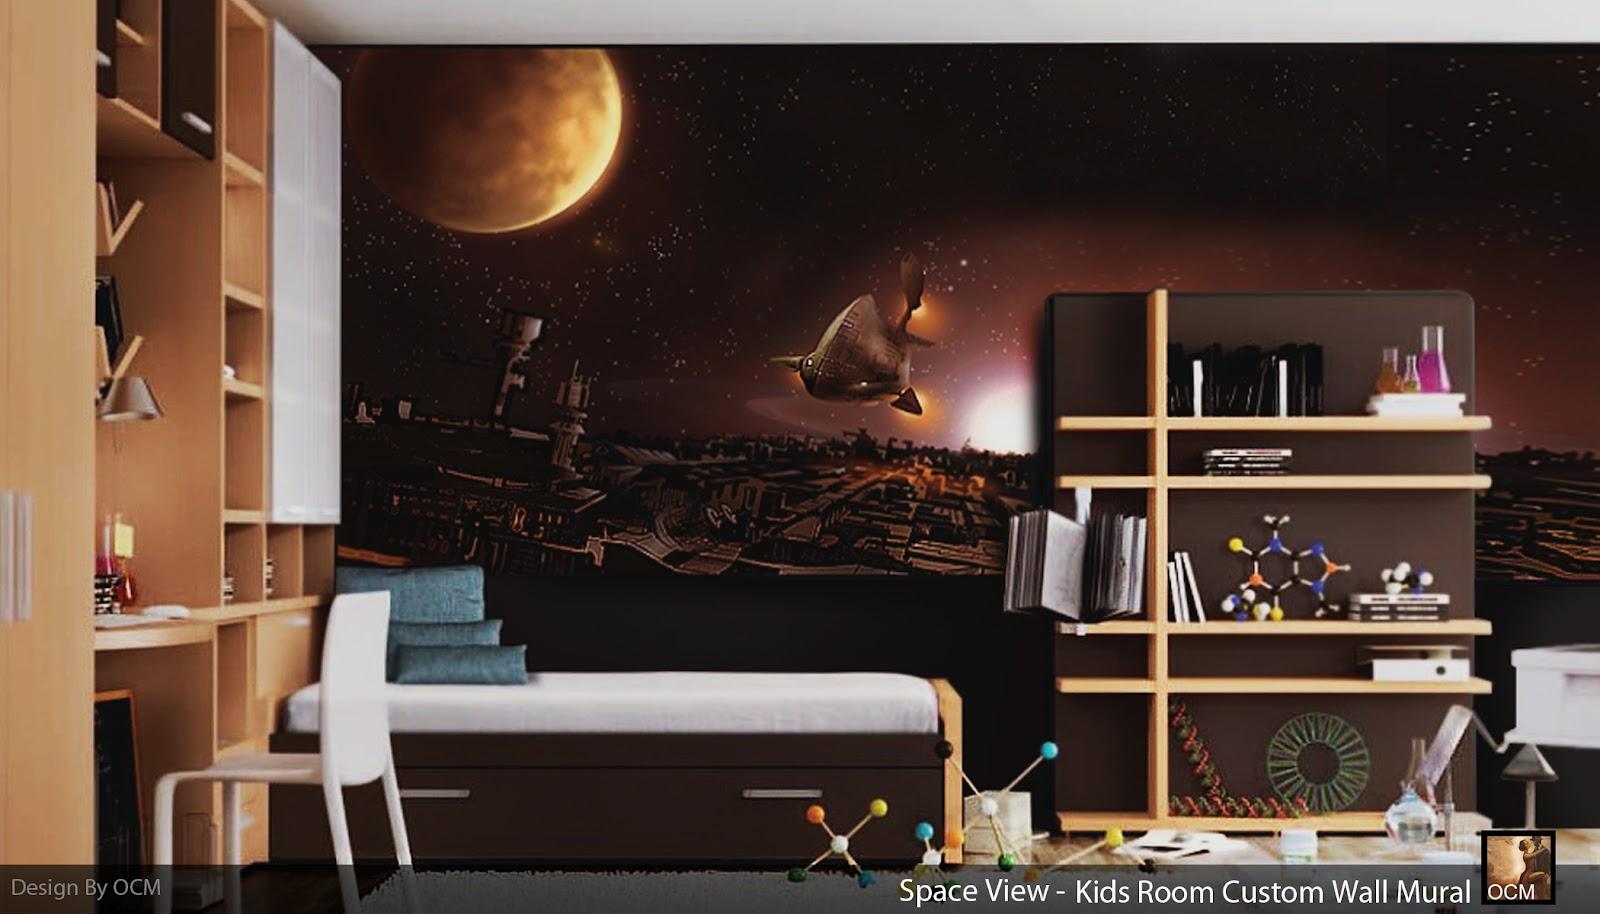 http://4.bp.blogspot.com/-NfnDVqszSME/UETiUrEFYBI/AAAAAAAAAZM/x5OaoenWlNE/s1600/Wall_Mural_Space_View_Kids_Room.jpg